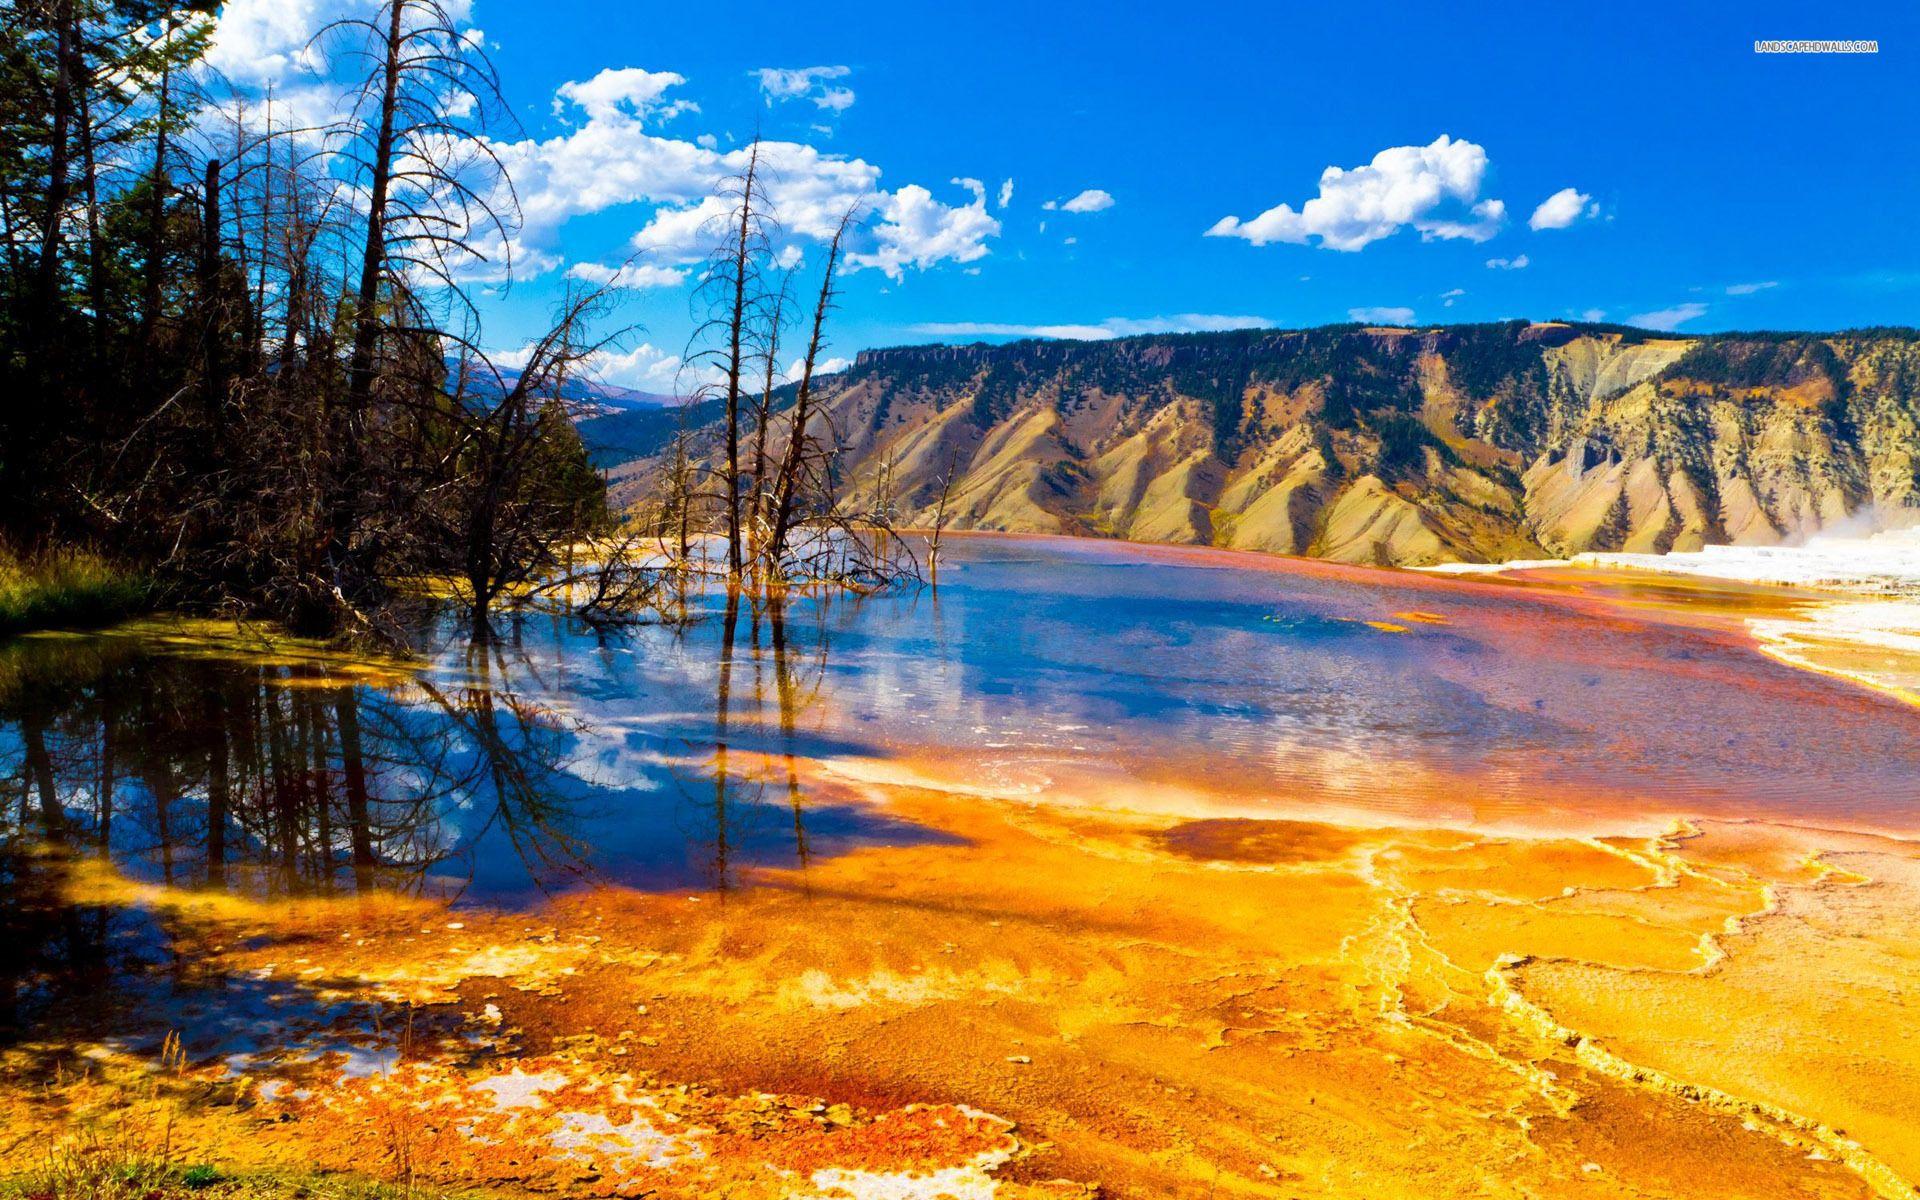 11 Yellowstone National Park Wallpaper 964 Yellowstone National